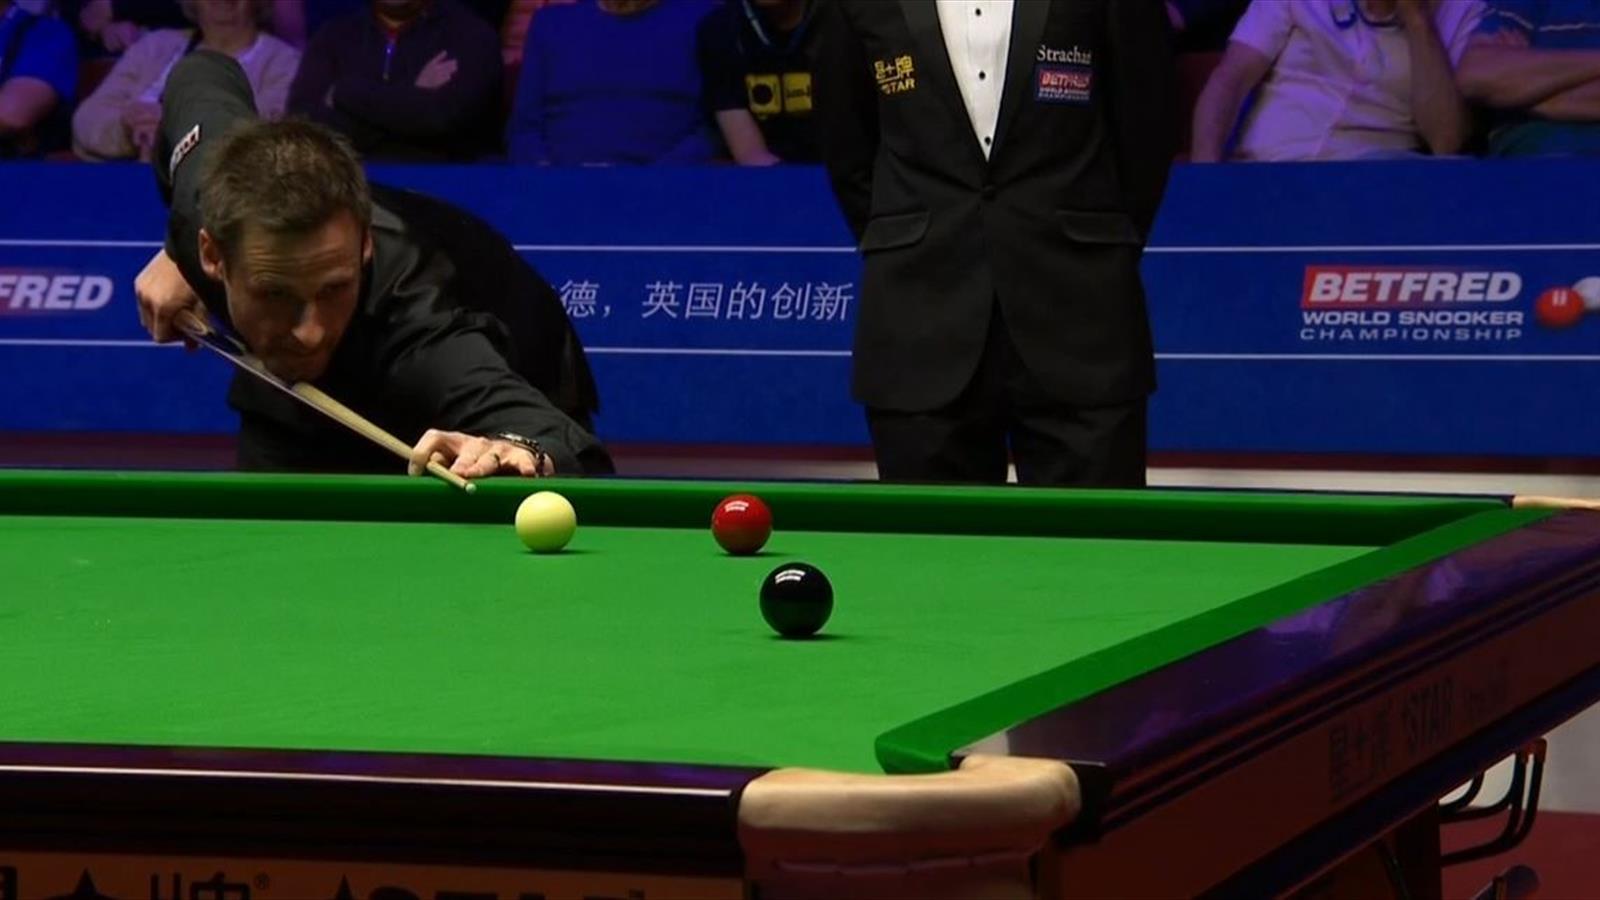 Weltrangliste Snooker